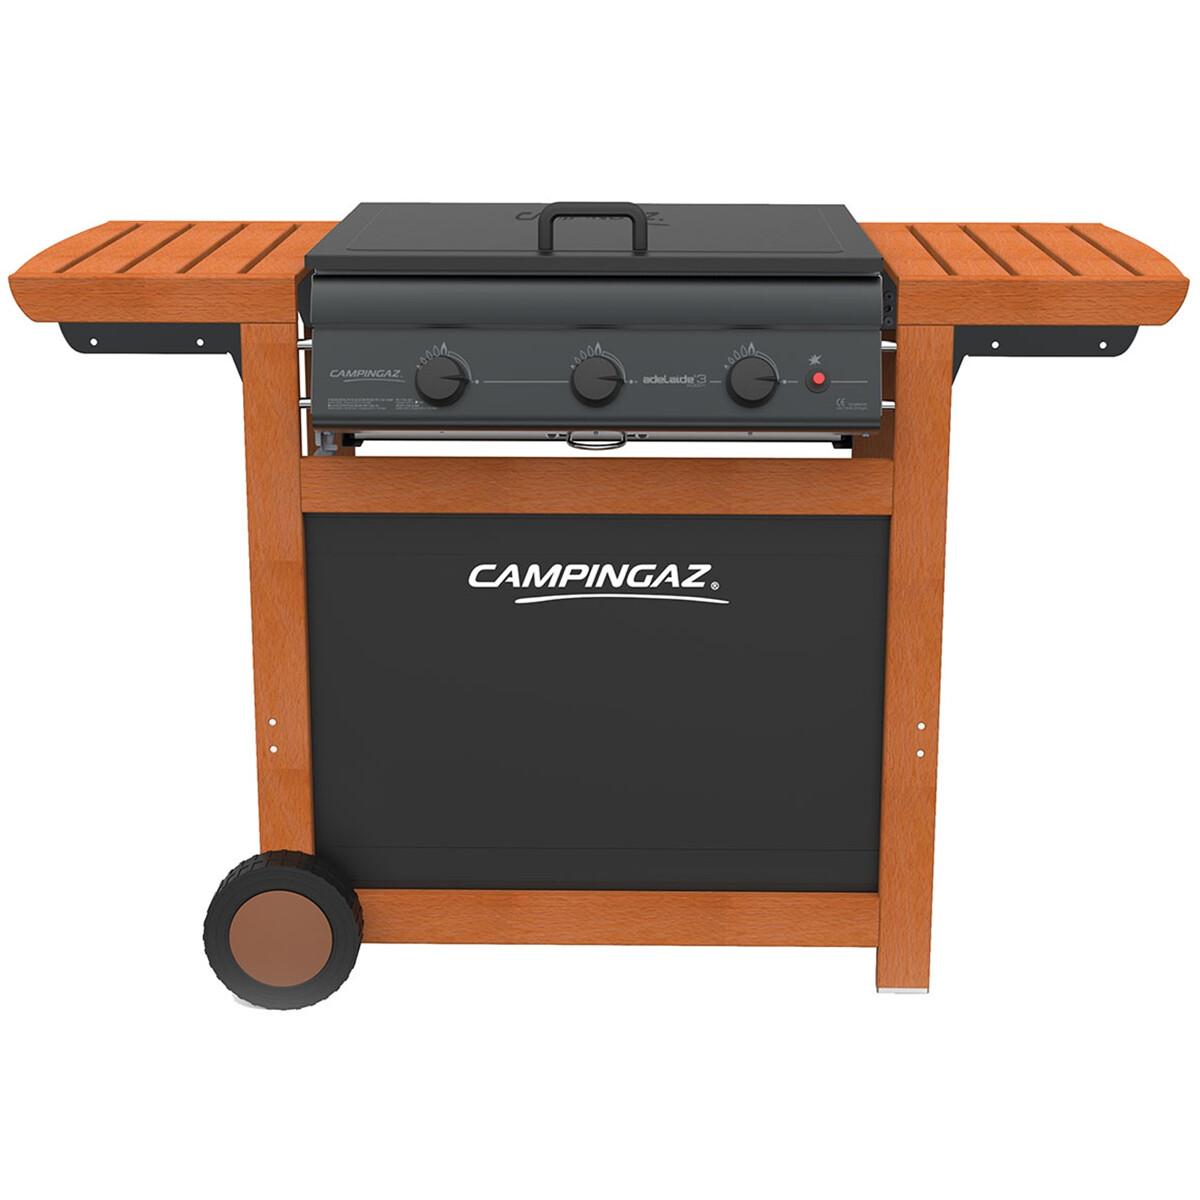 campingaz adelaide 3 woody barbecue a gas il mondo del barbecue. Black Bedroom Furniture Sets. Home Design Ideas